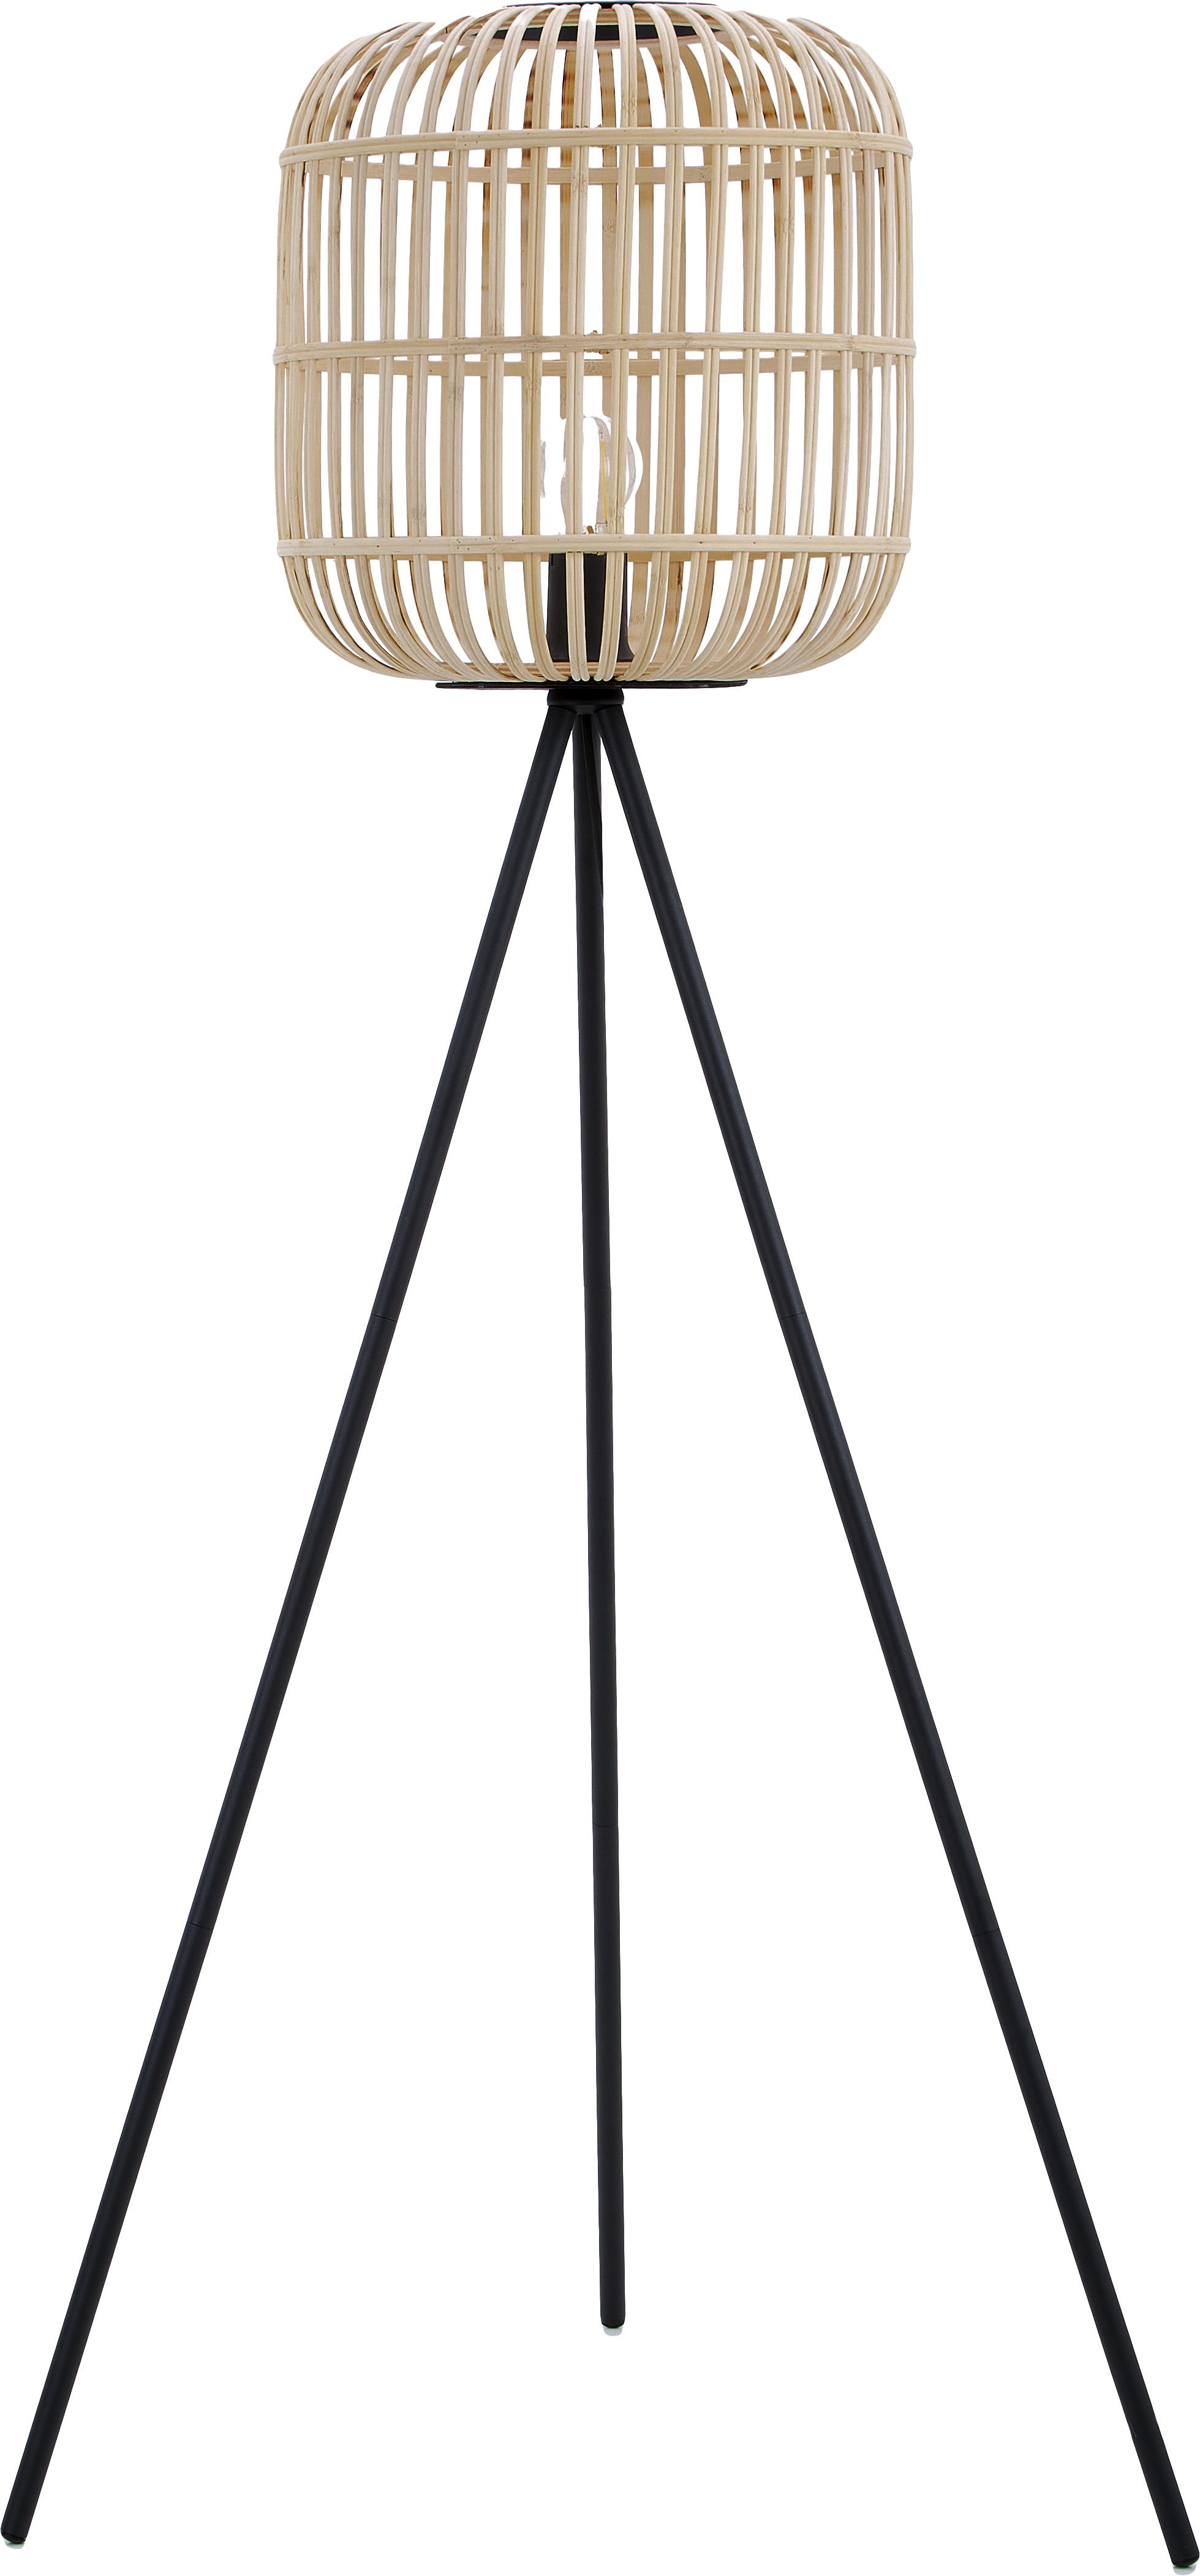 Tripod Stehlampe Bordesley im Boho-Style, Lampenschirm: Holz, Schwarz, Holz, Ø 35 x H 139 cm